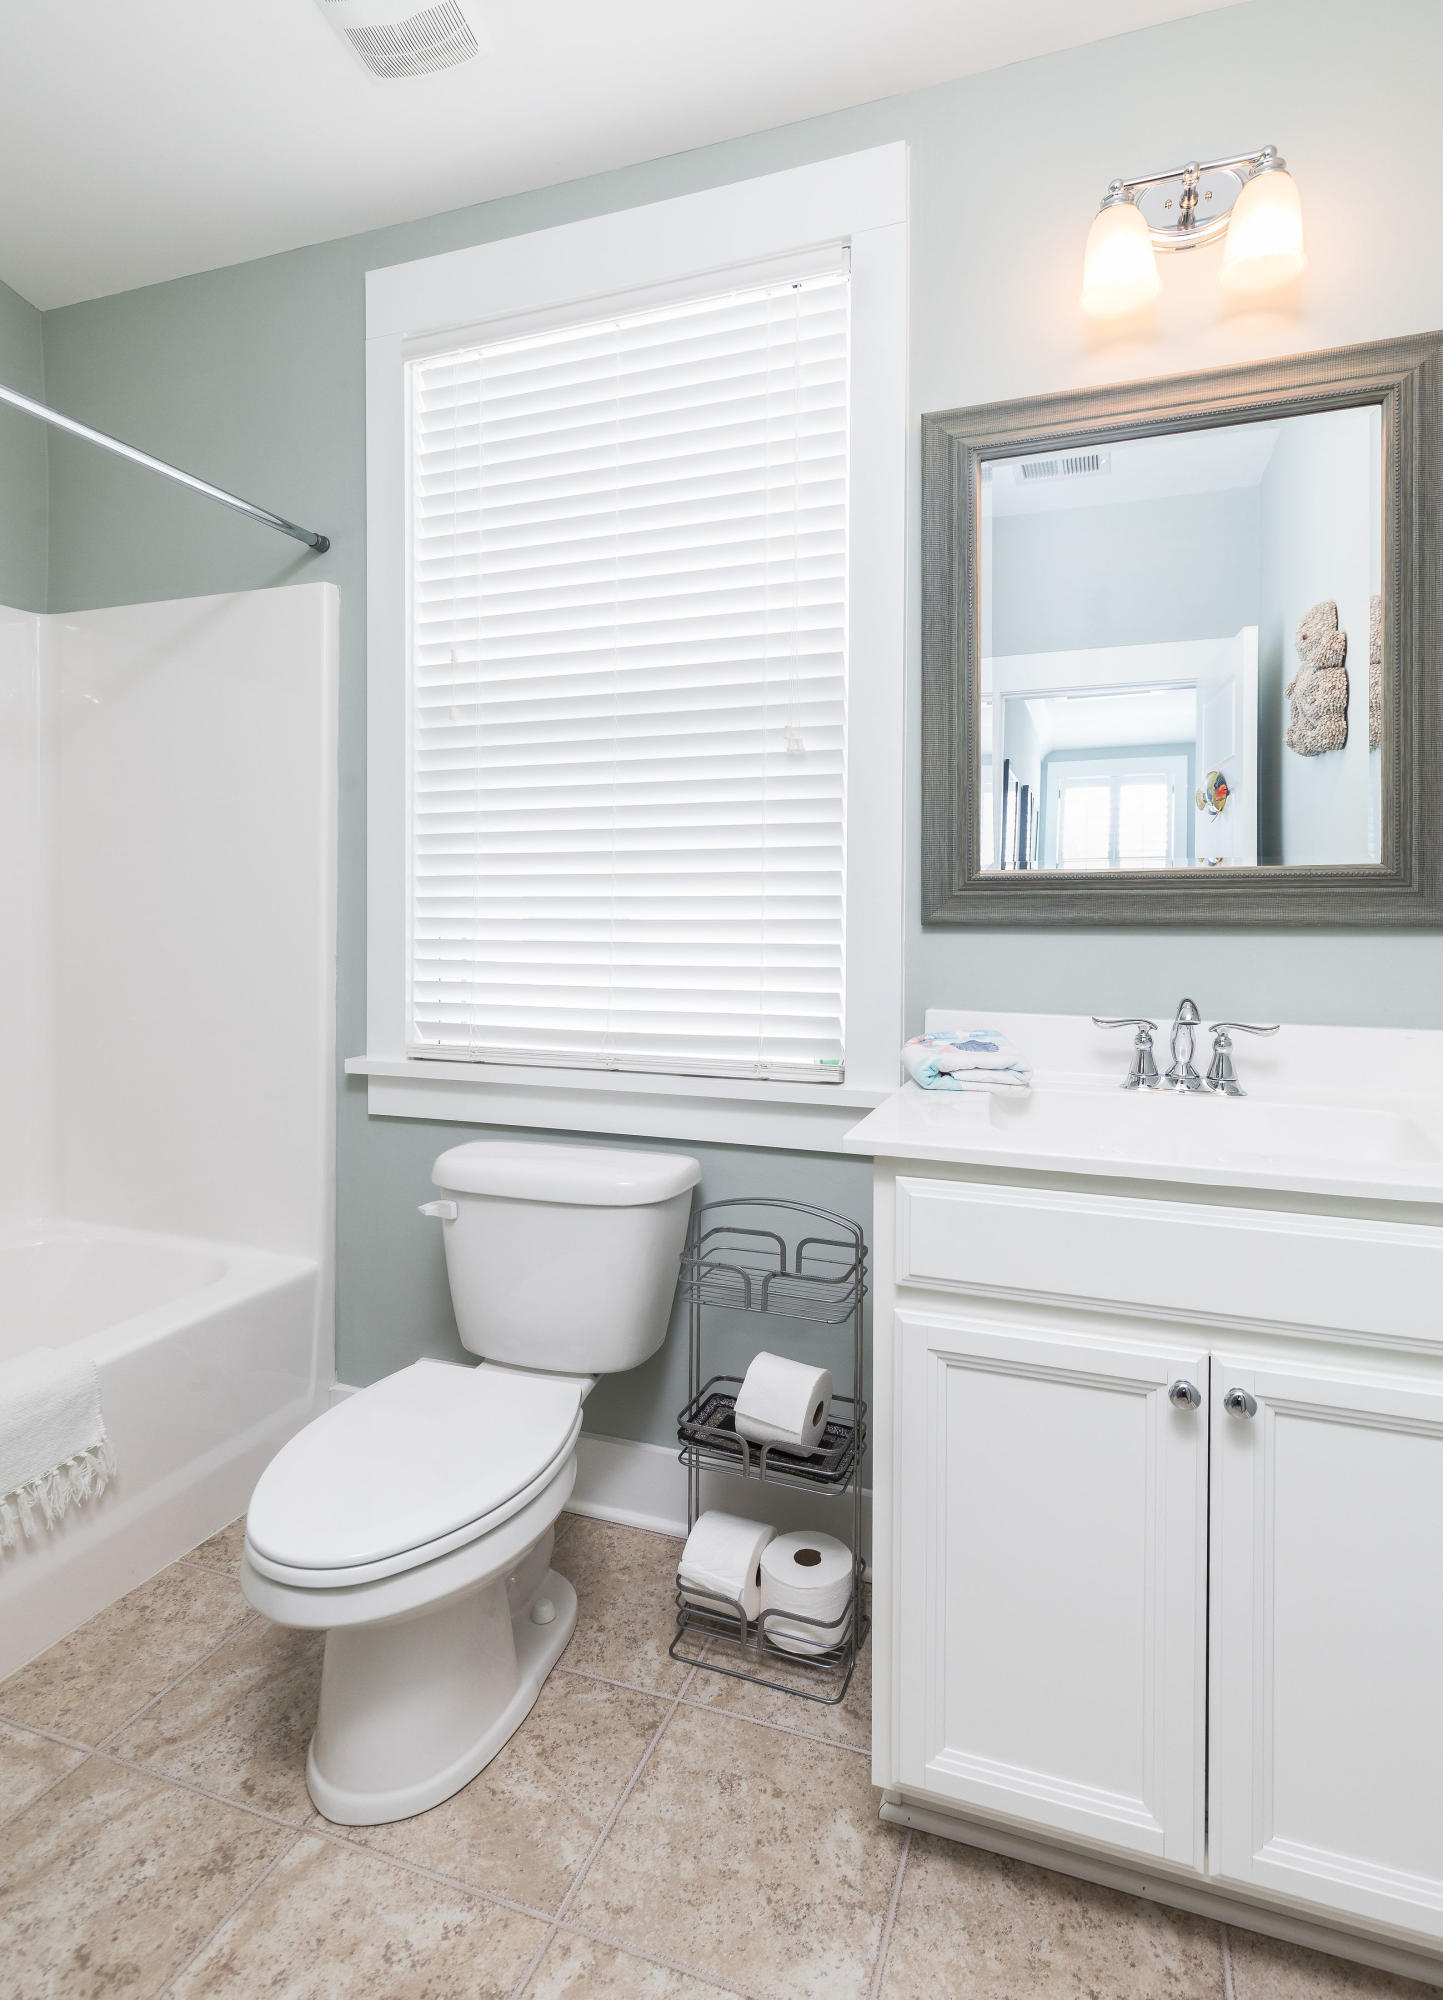 Carolina Park Homes For Sale - 3541 Sewel, Mount Pleasant, SC - 9